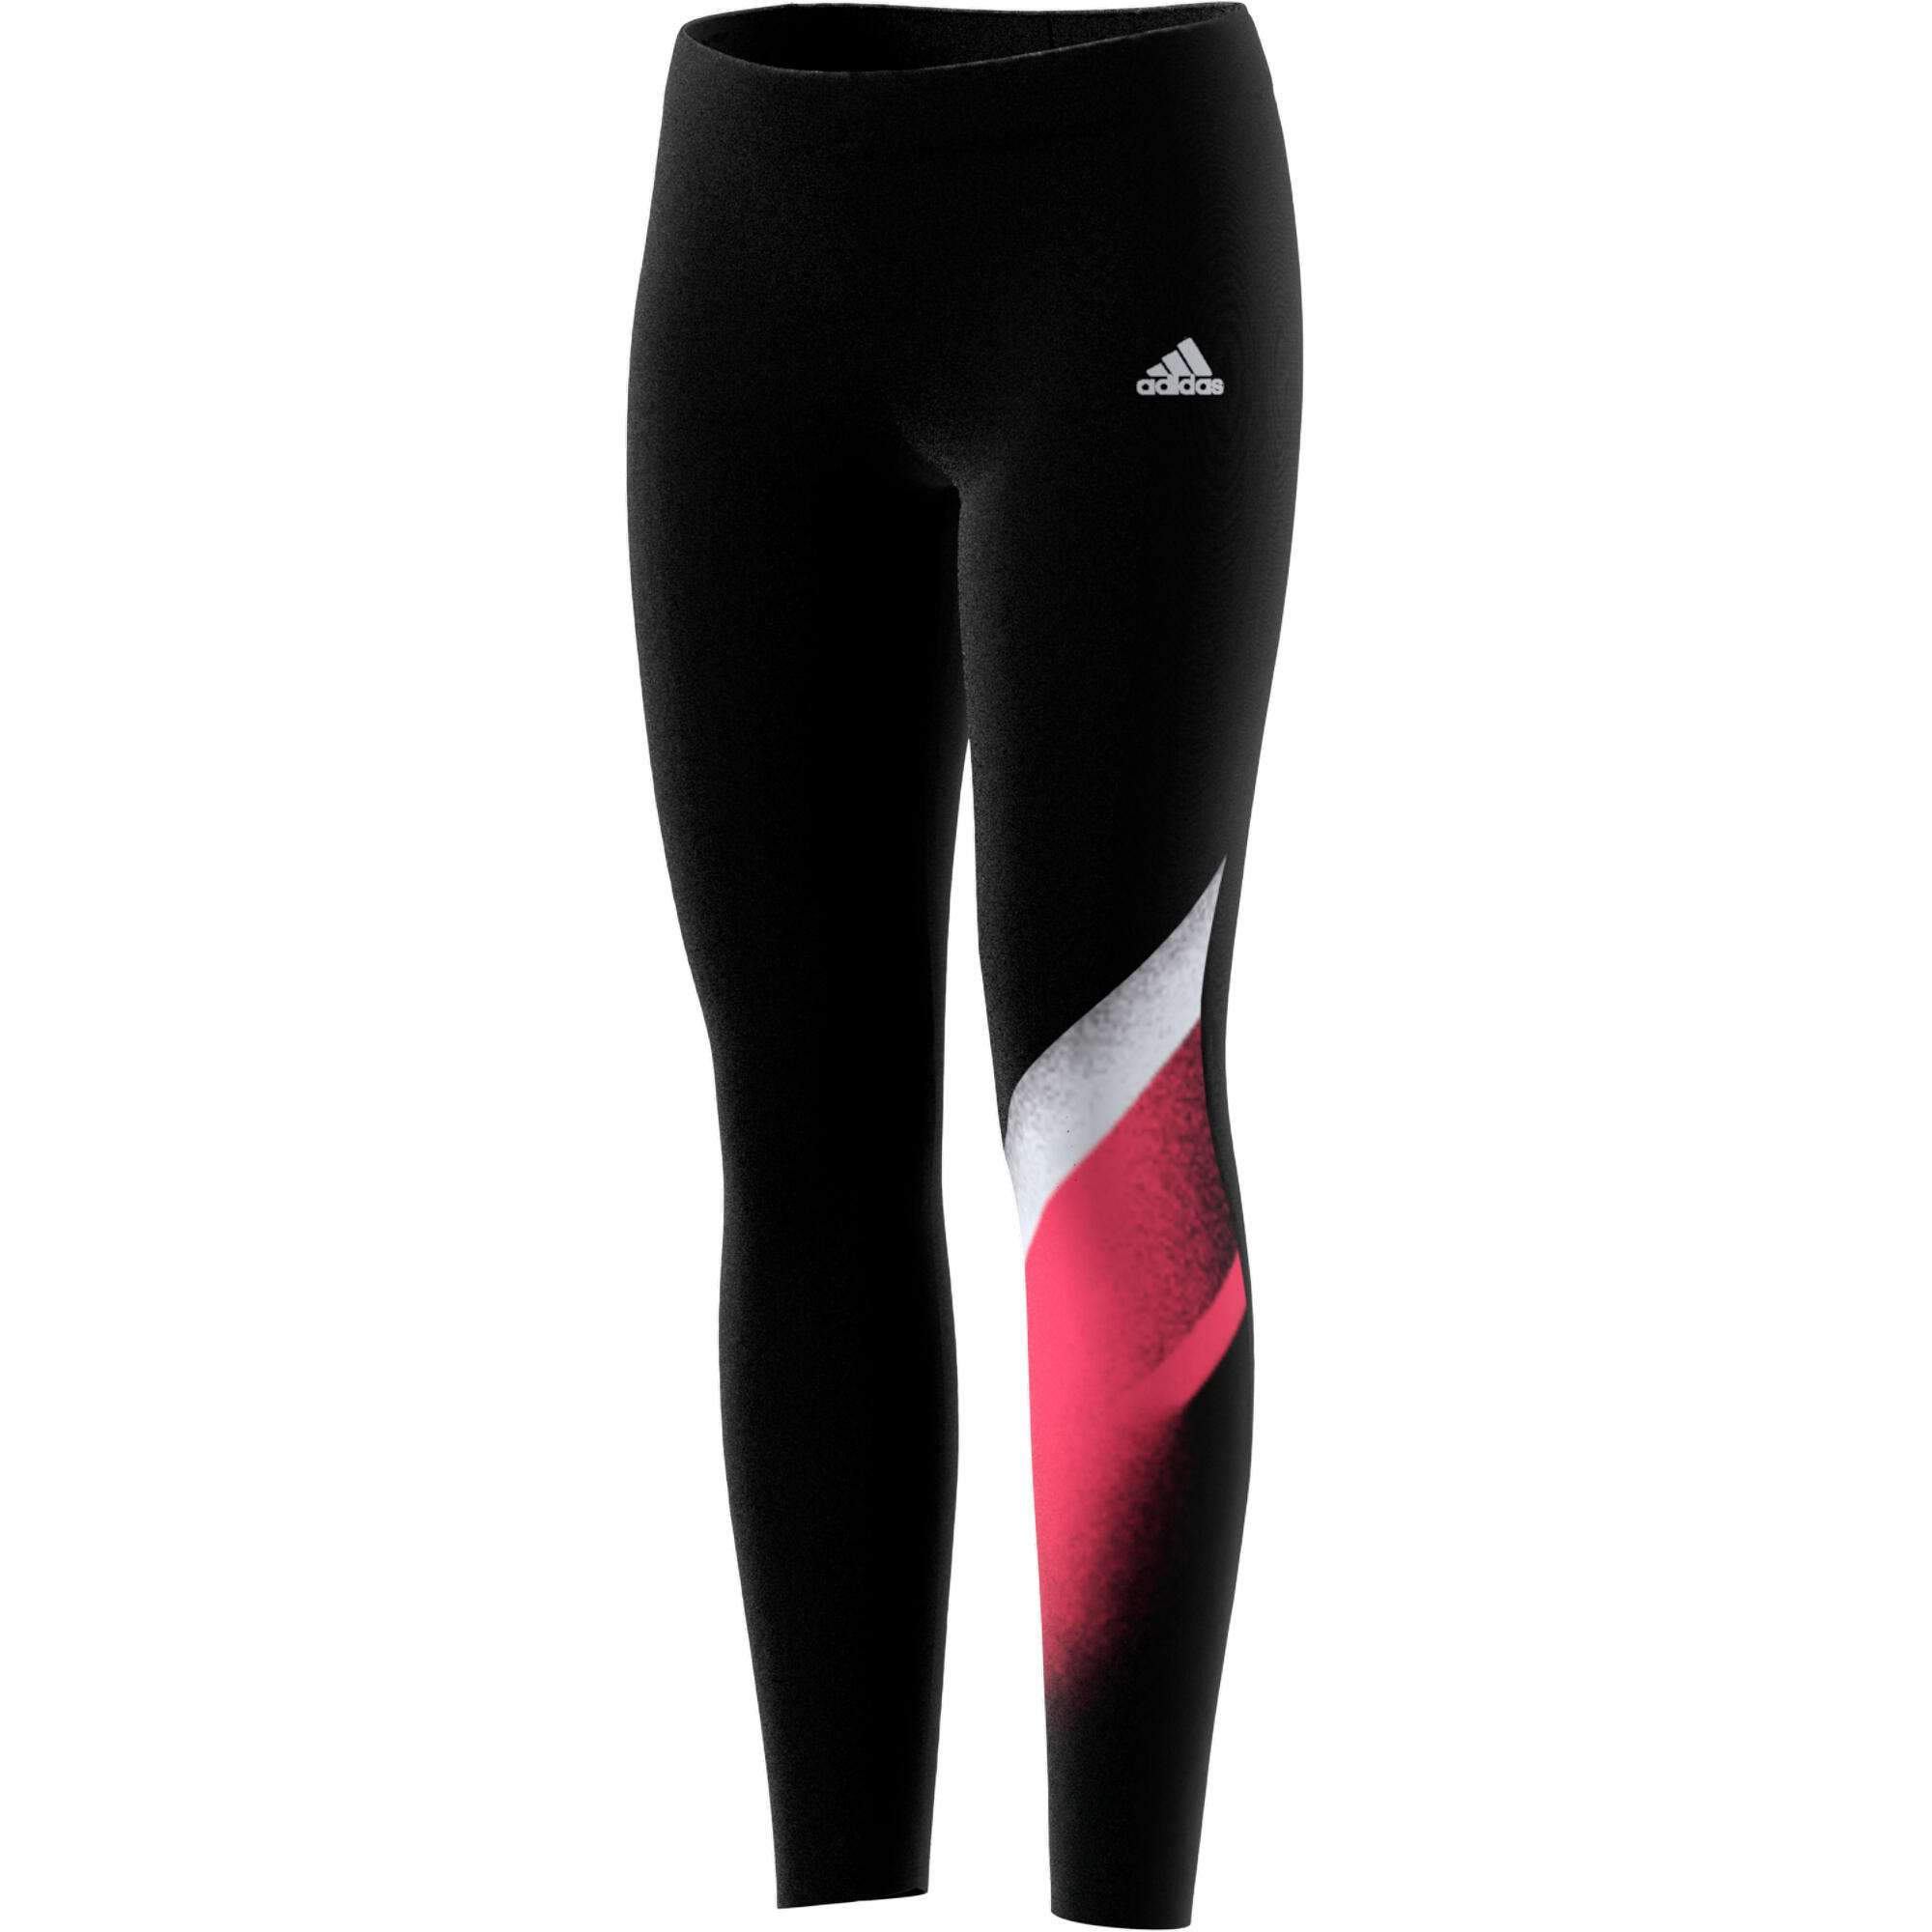 Colanți Adidas negru fete imagine